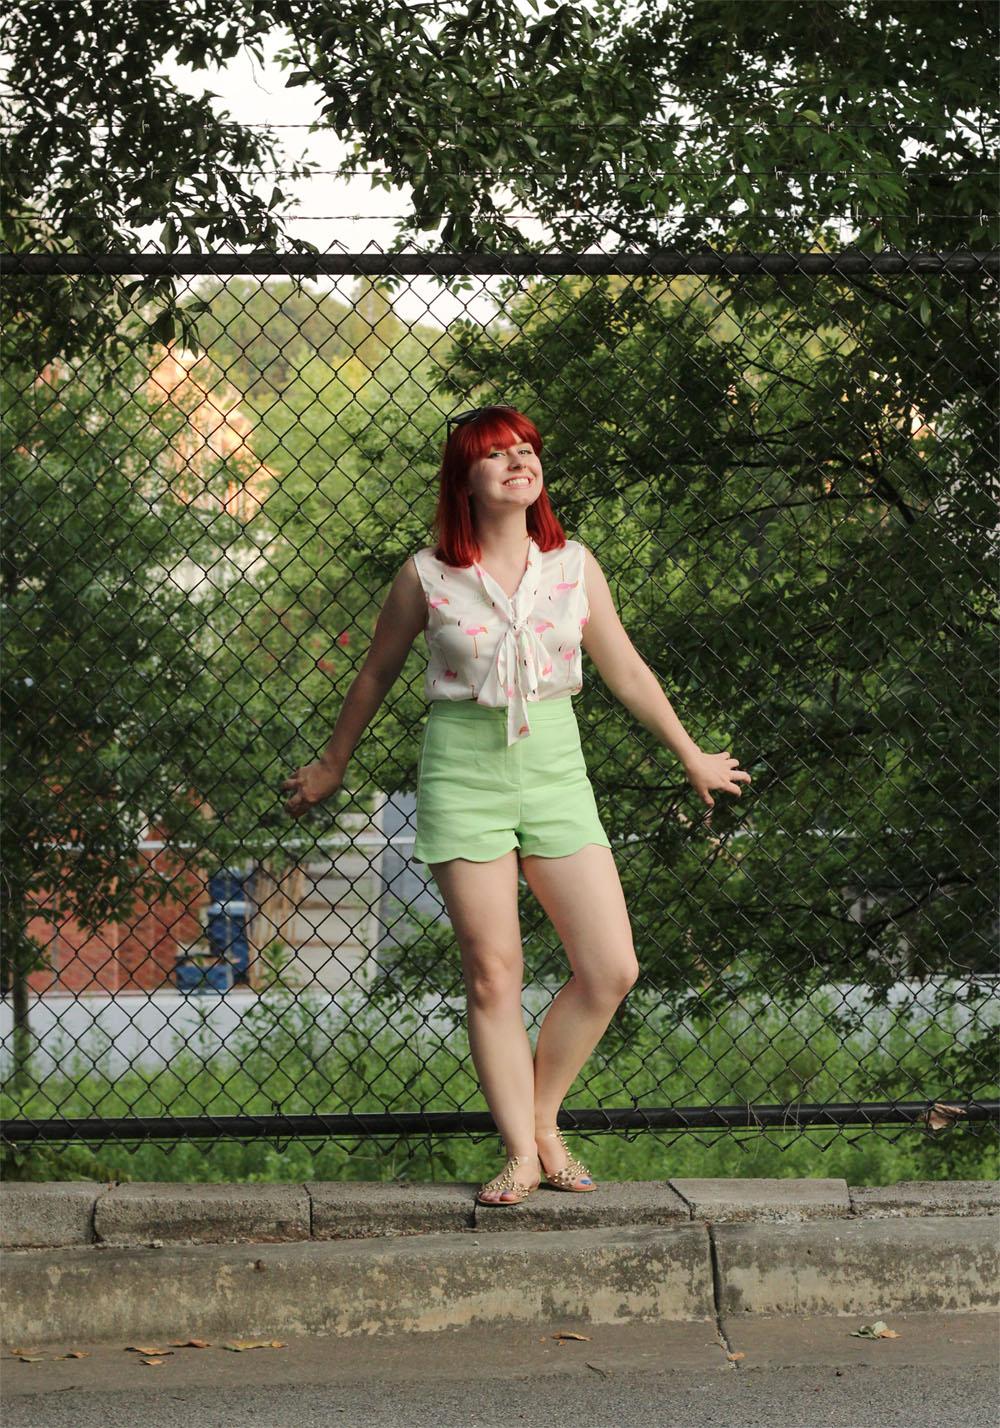 High Waist Pastel Green Shorts Flamingo Print SheIn Top Clear Studded Sandals